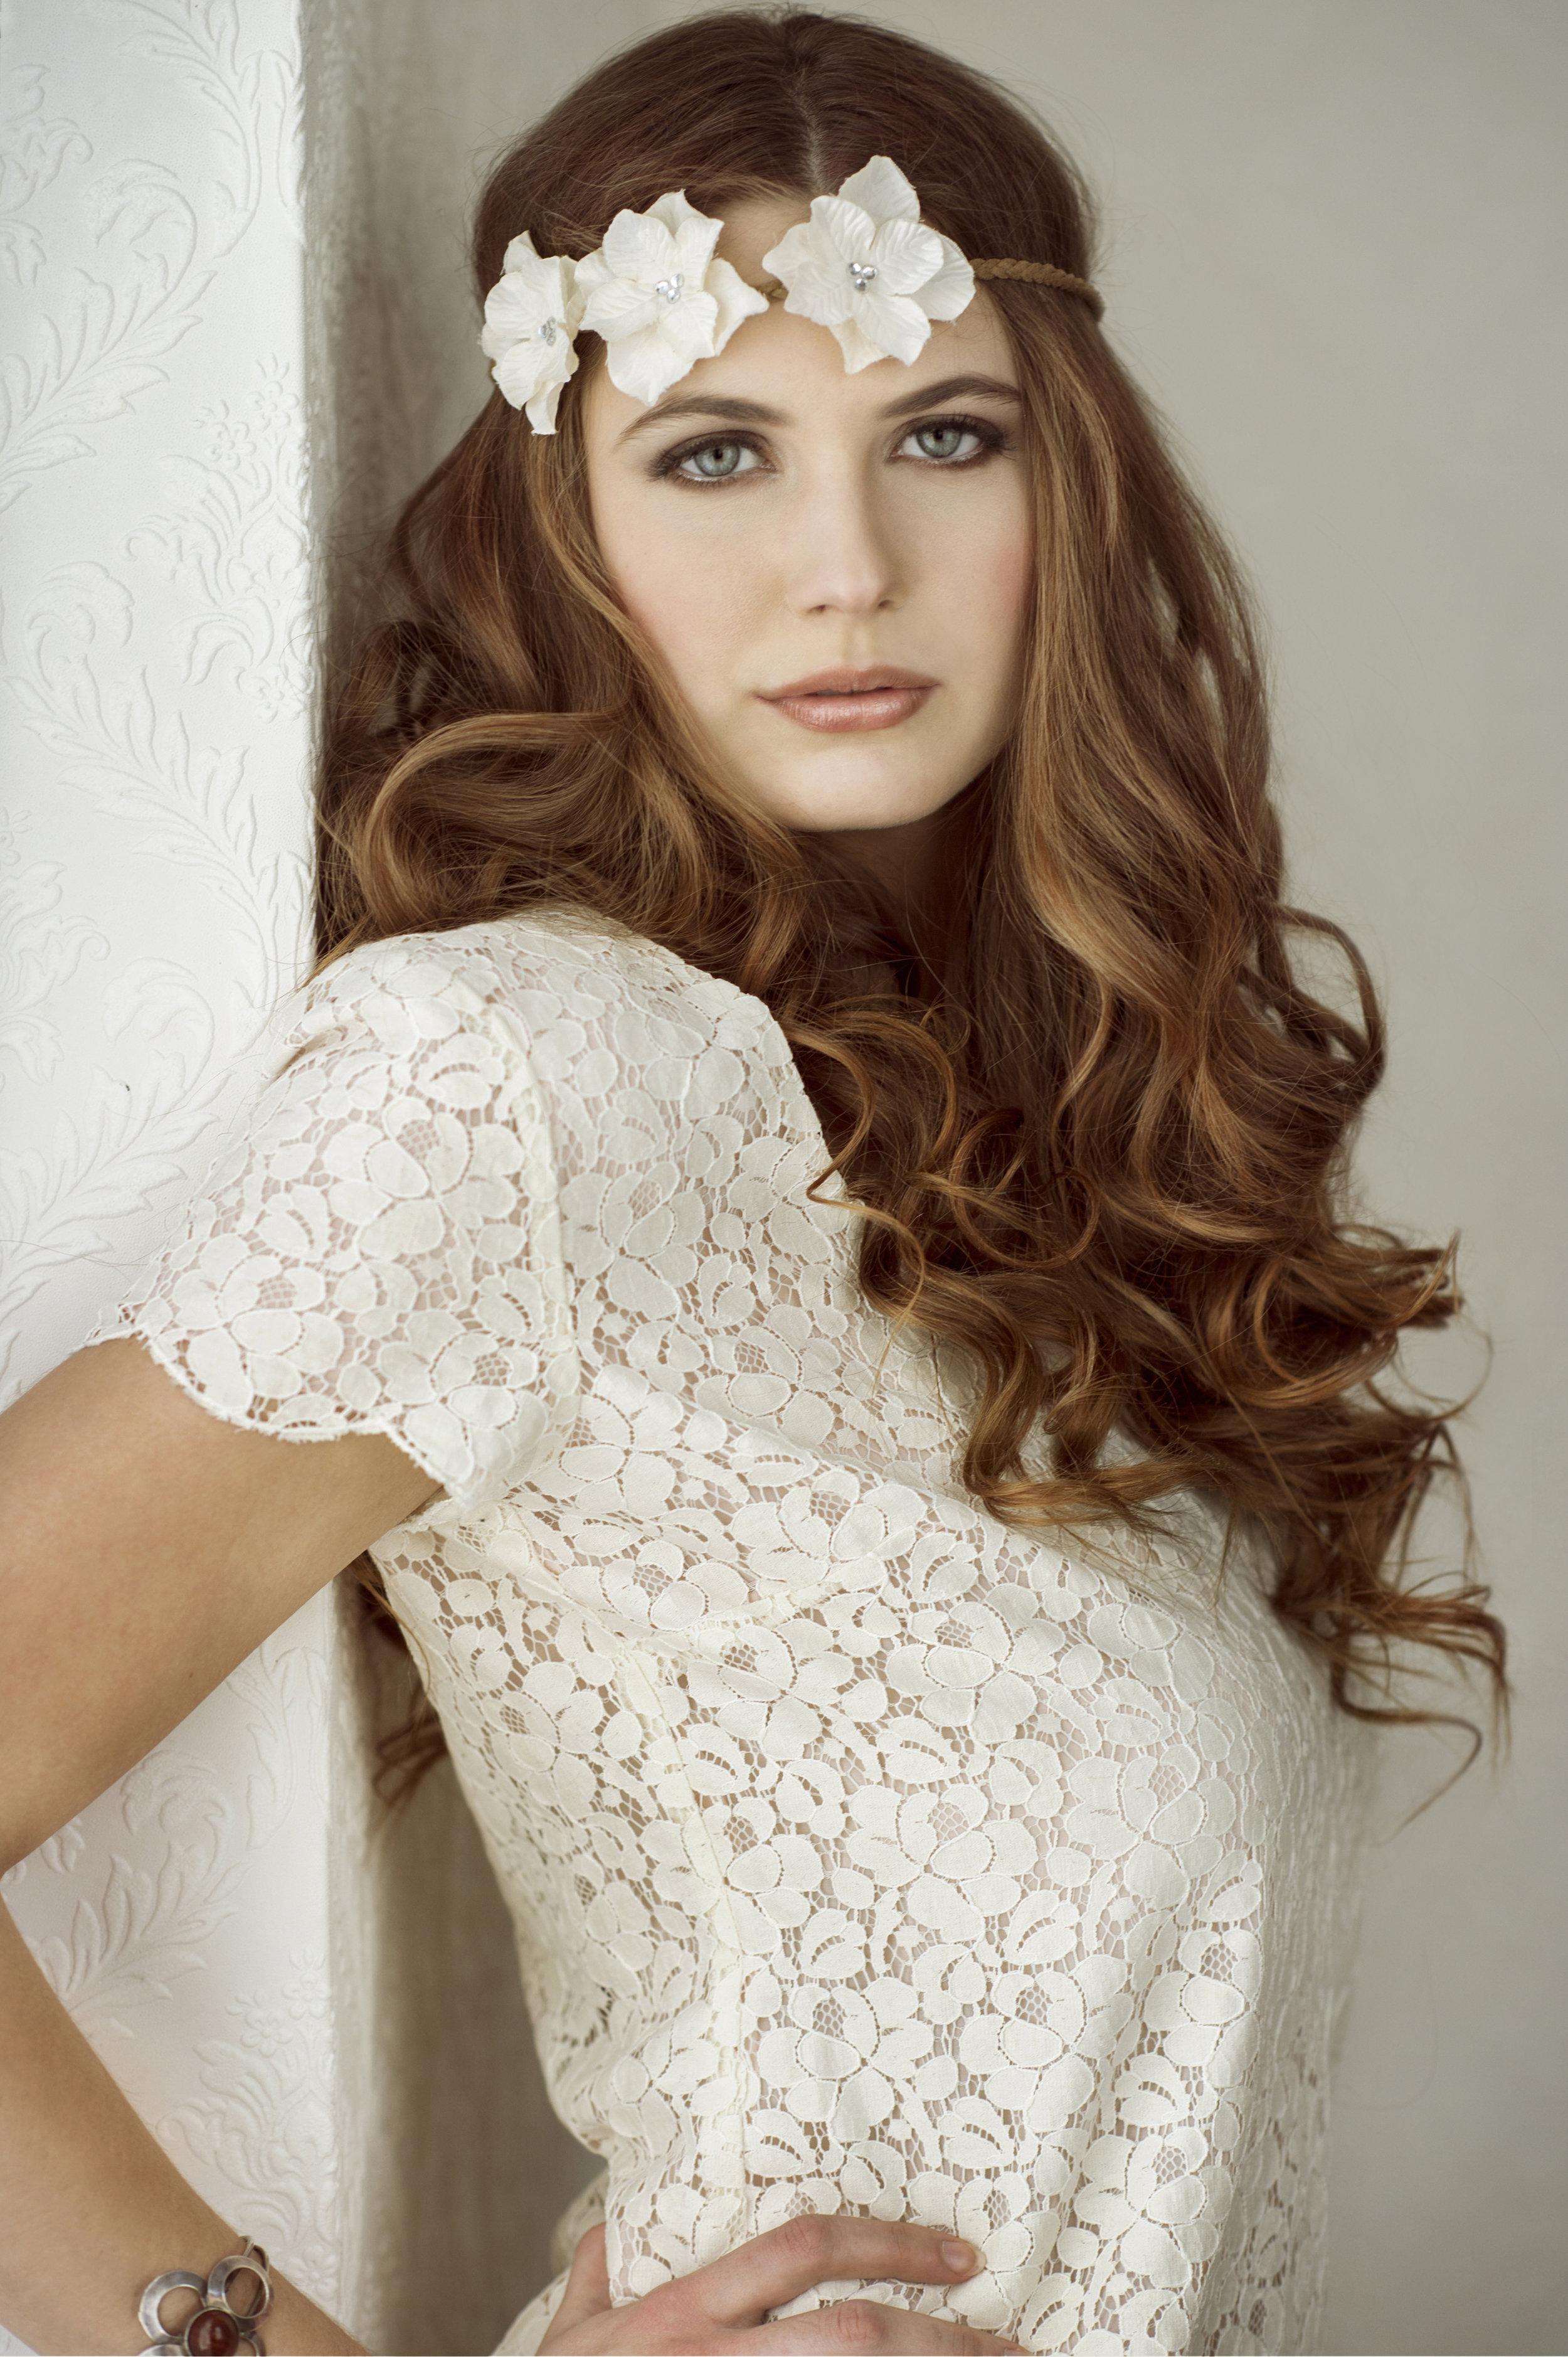 MartaHewson _Bohemian girl with white flowers in her hair.jpg